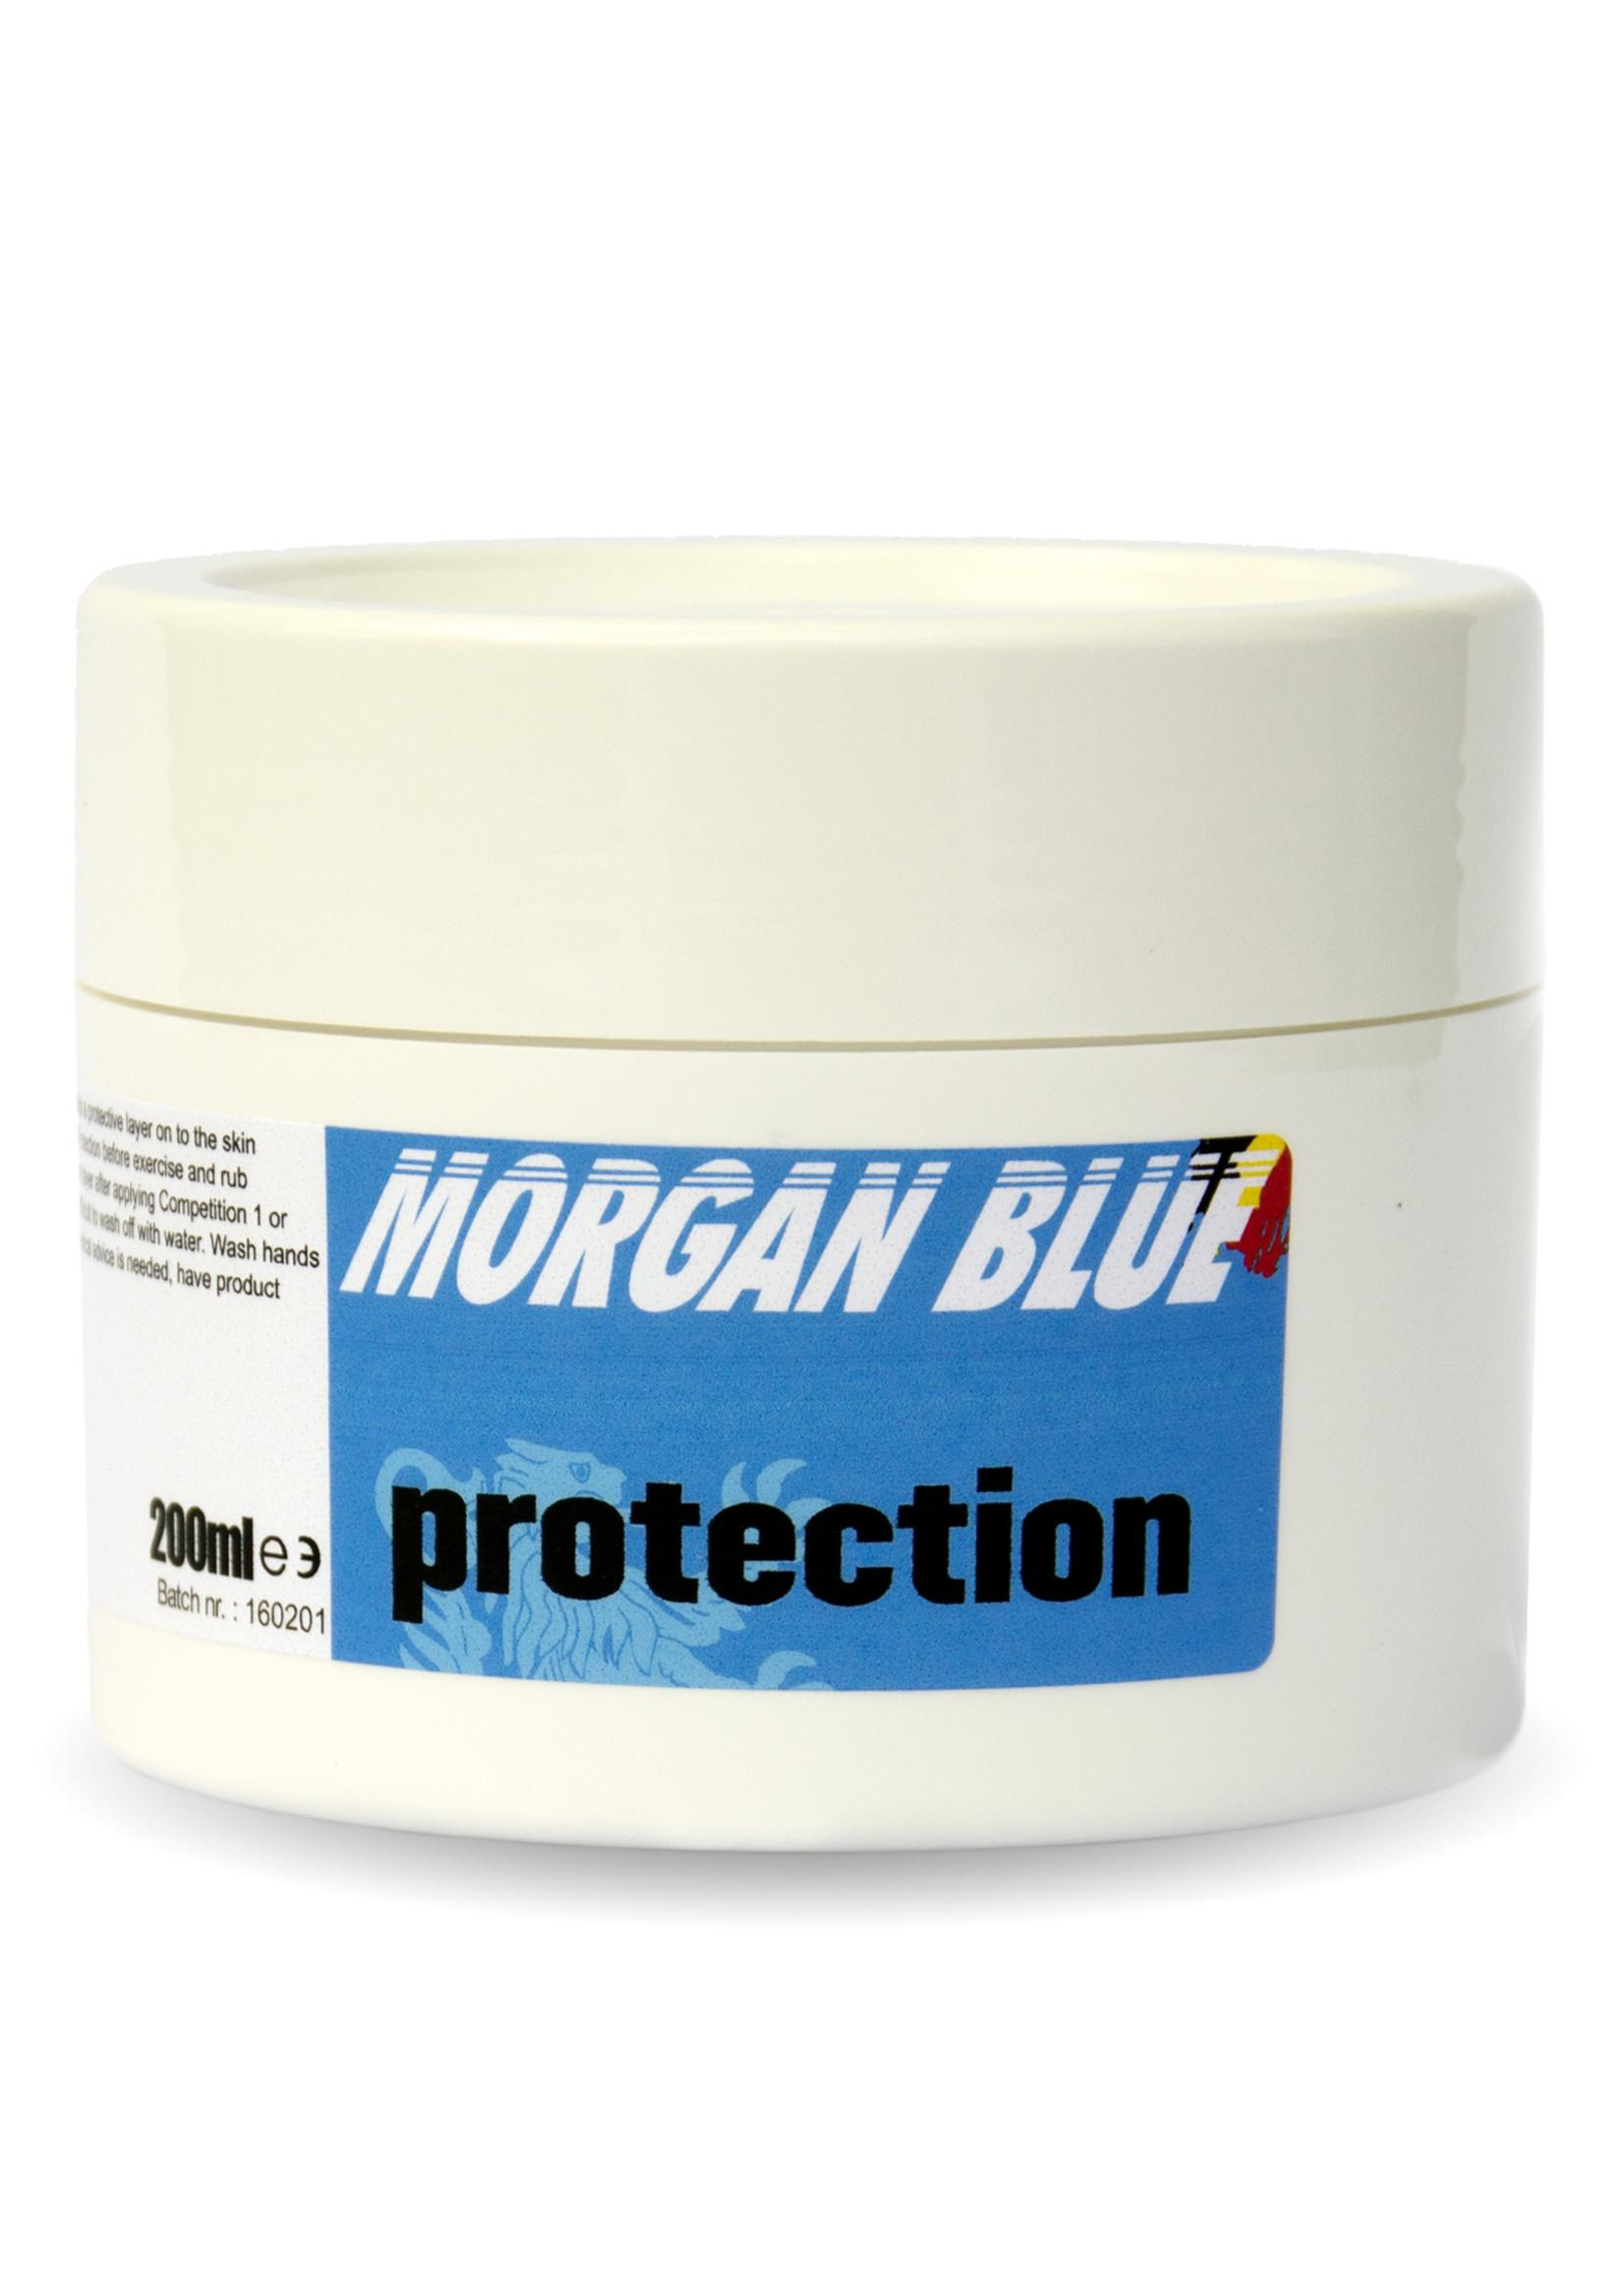 Morgan Blue Protection